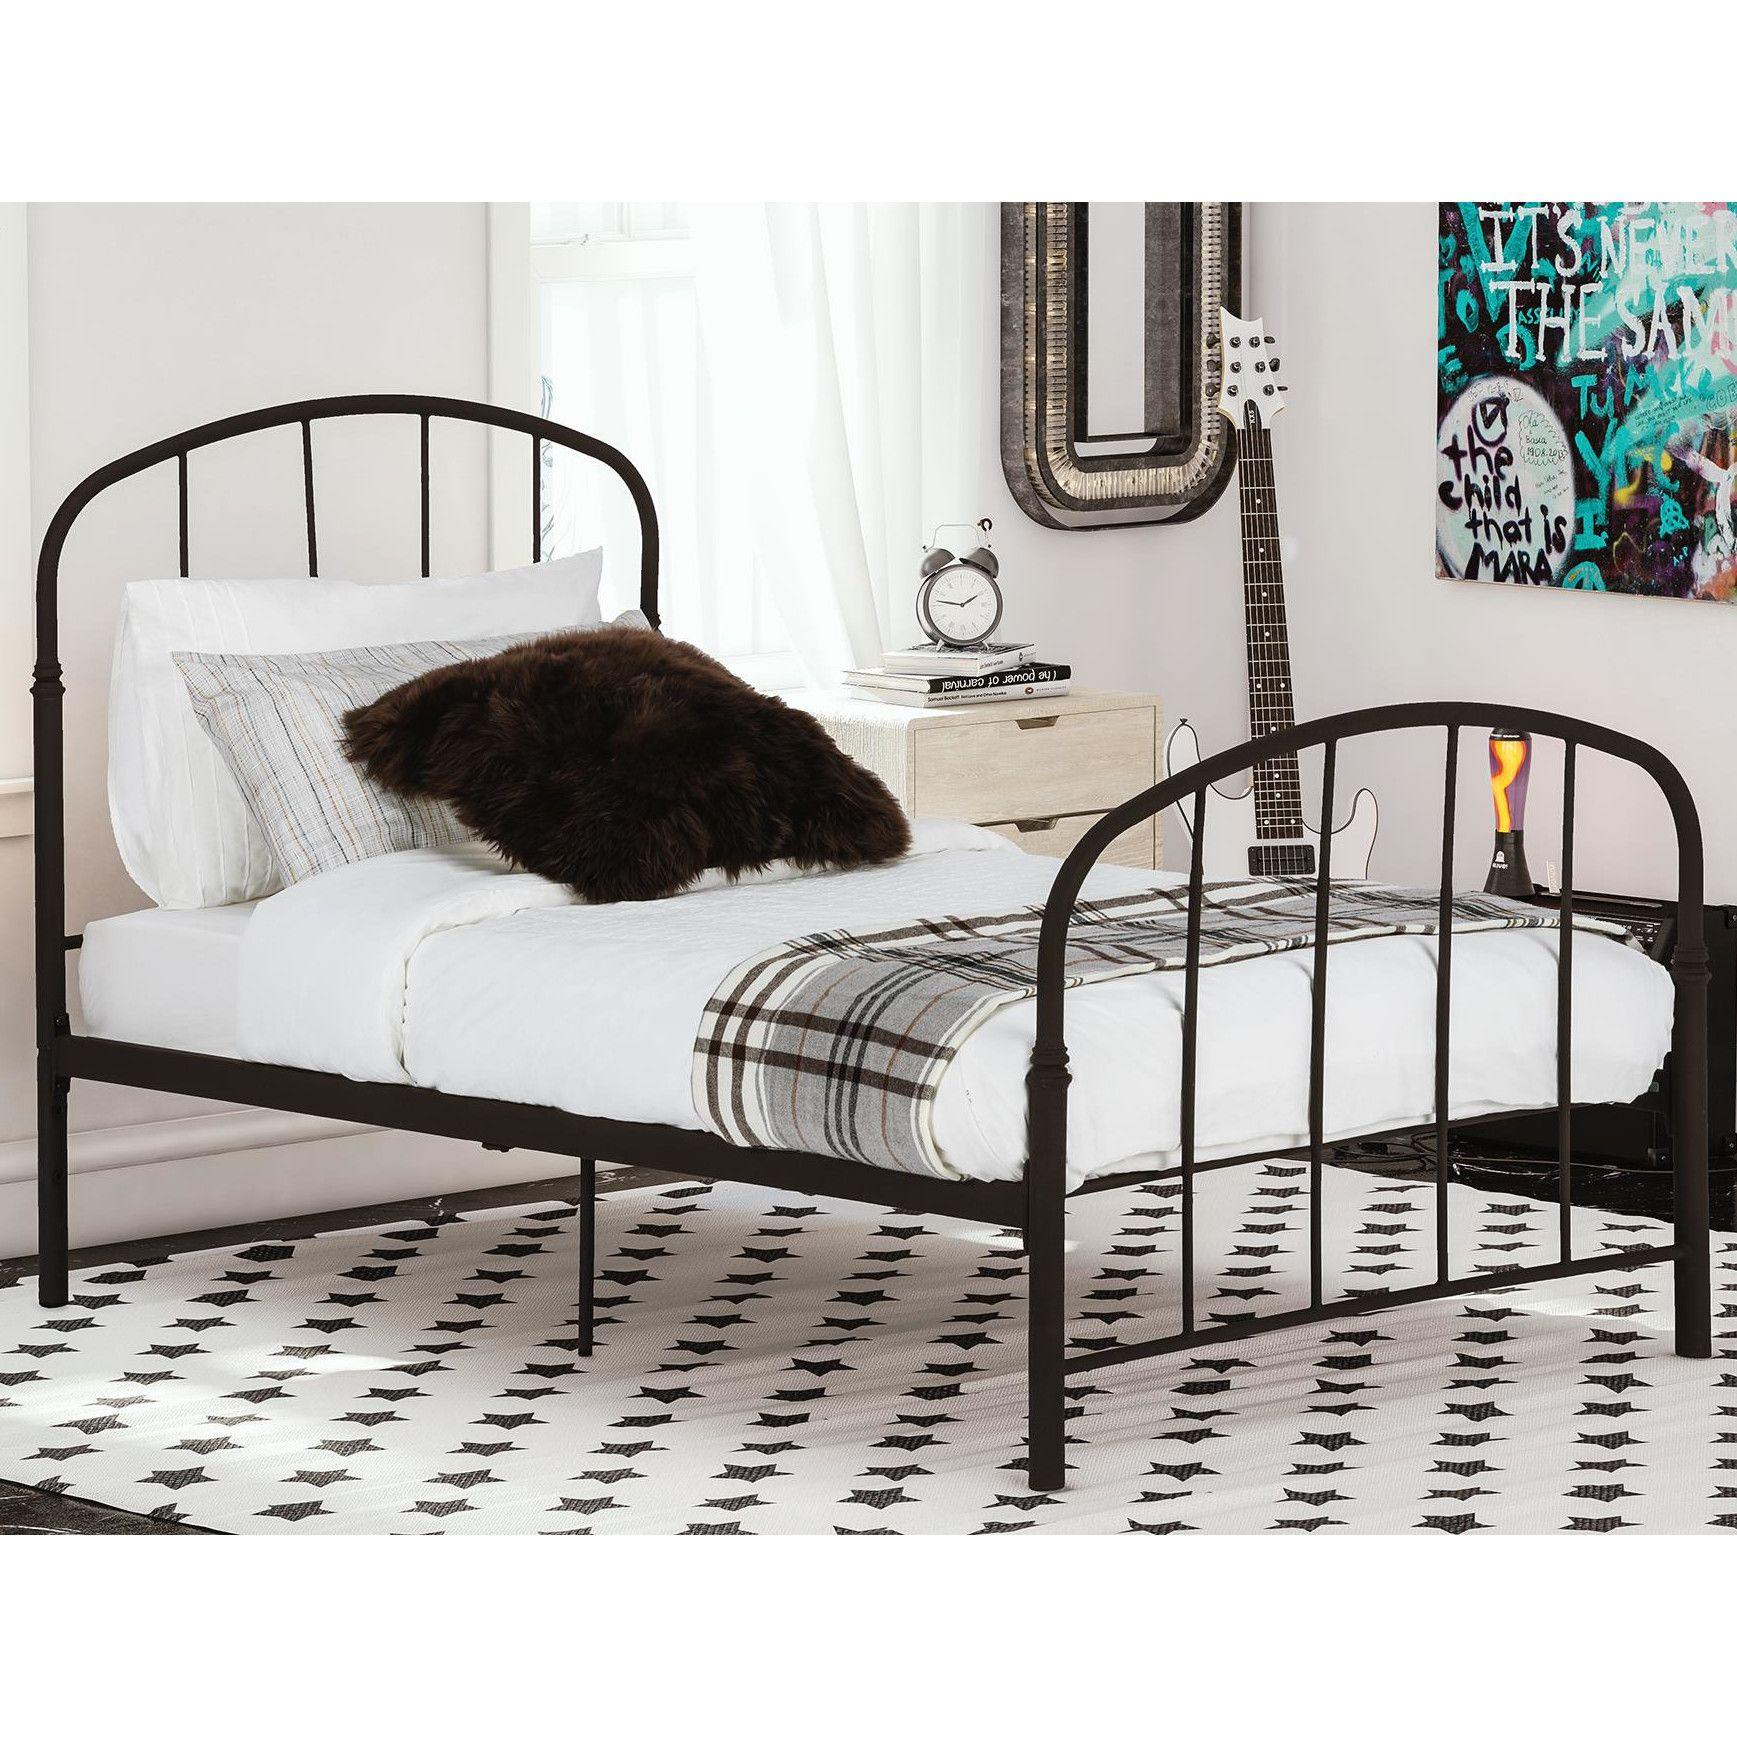 Viv Rae Oliver Twin Metal Bed Bed White Bed Frame Metal Beds